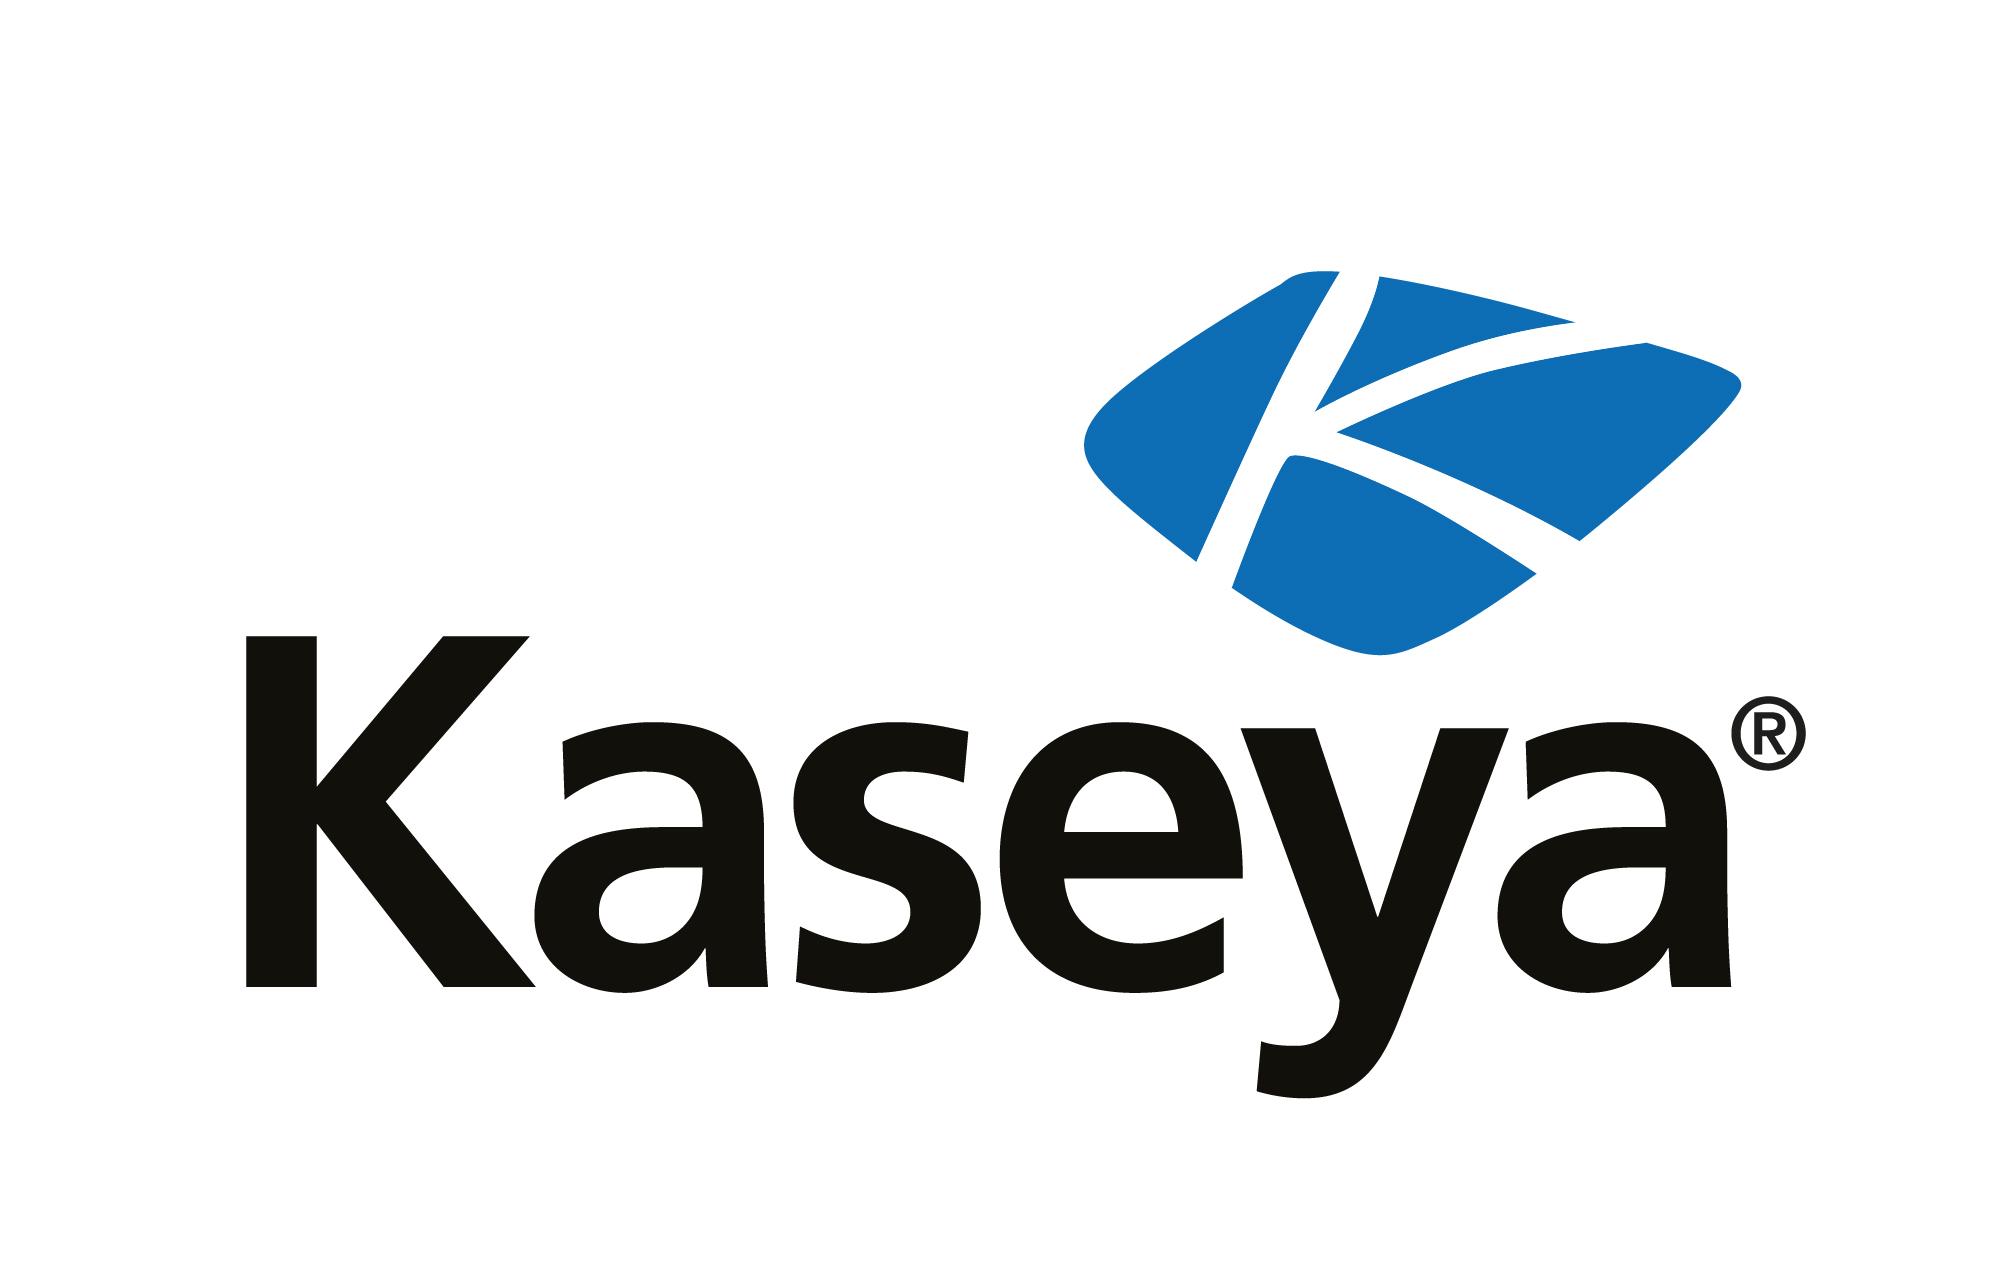 Kaseya launcht neue Powered Services